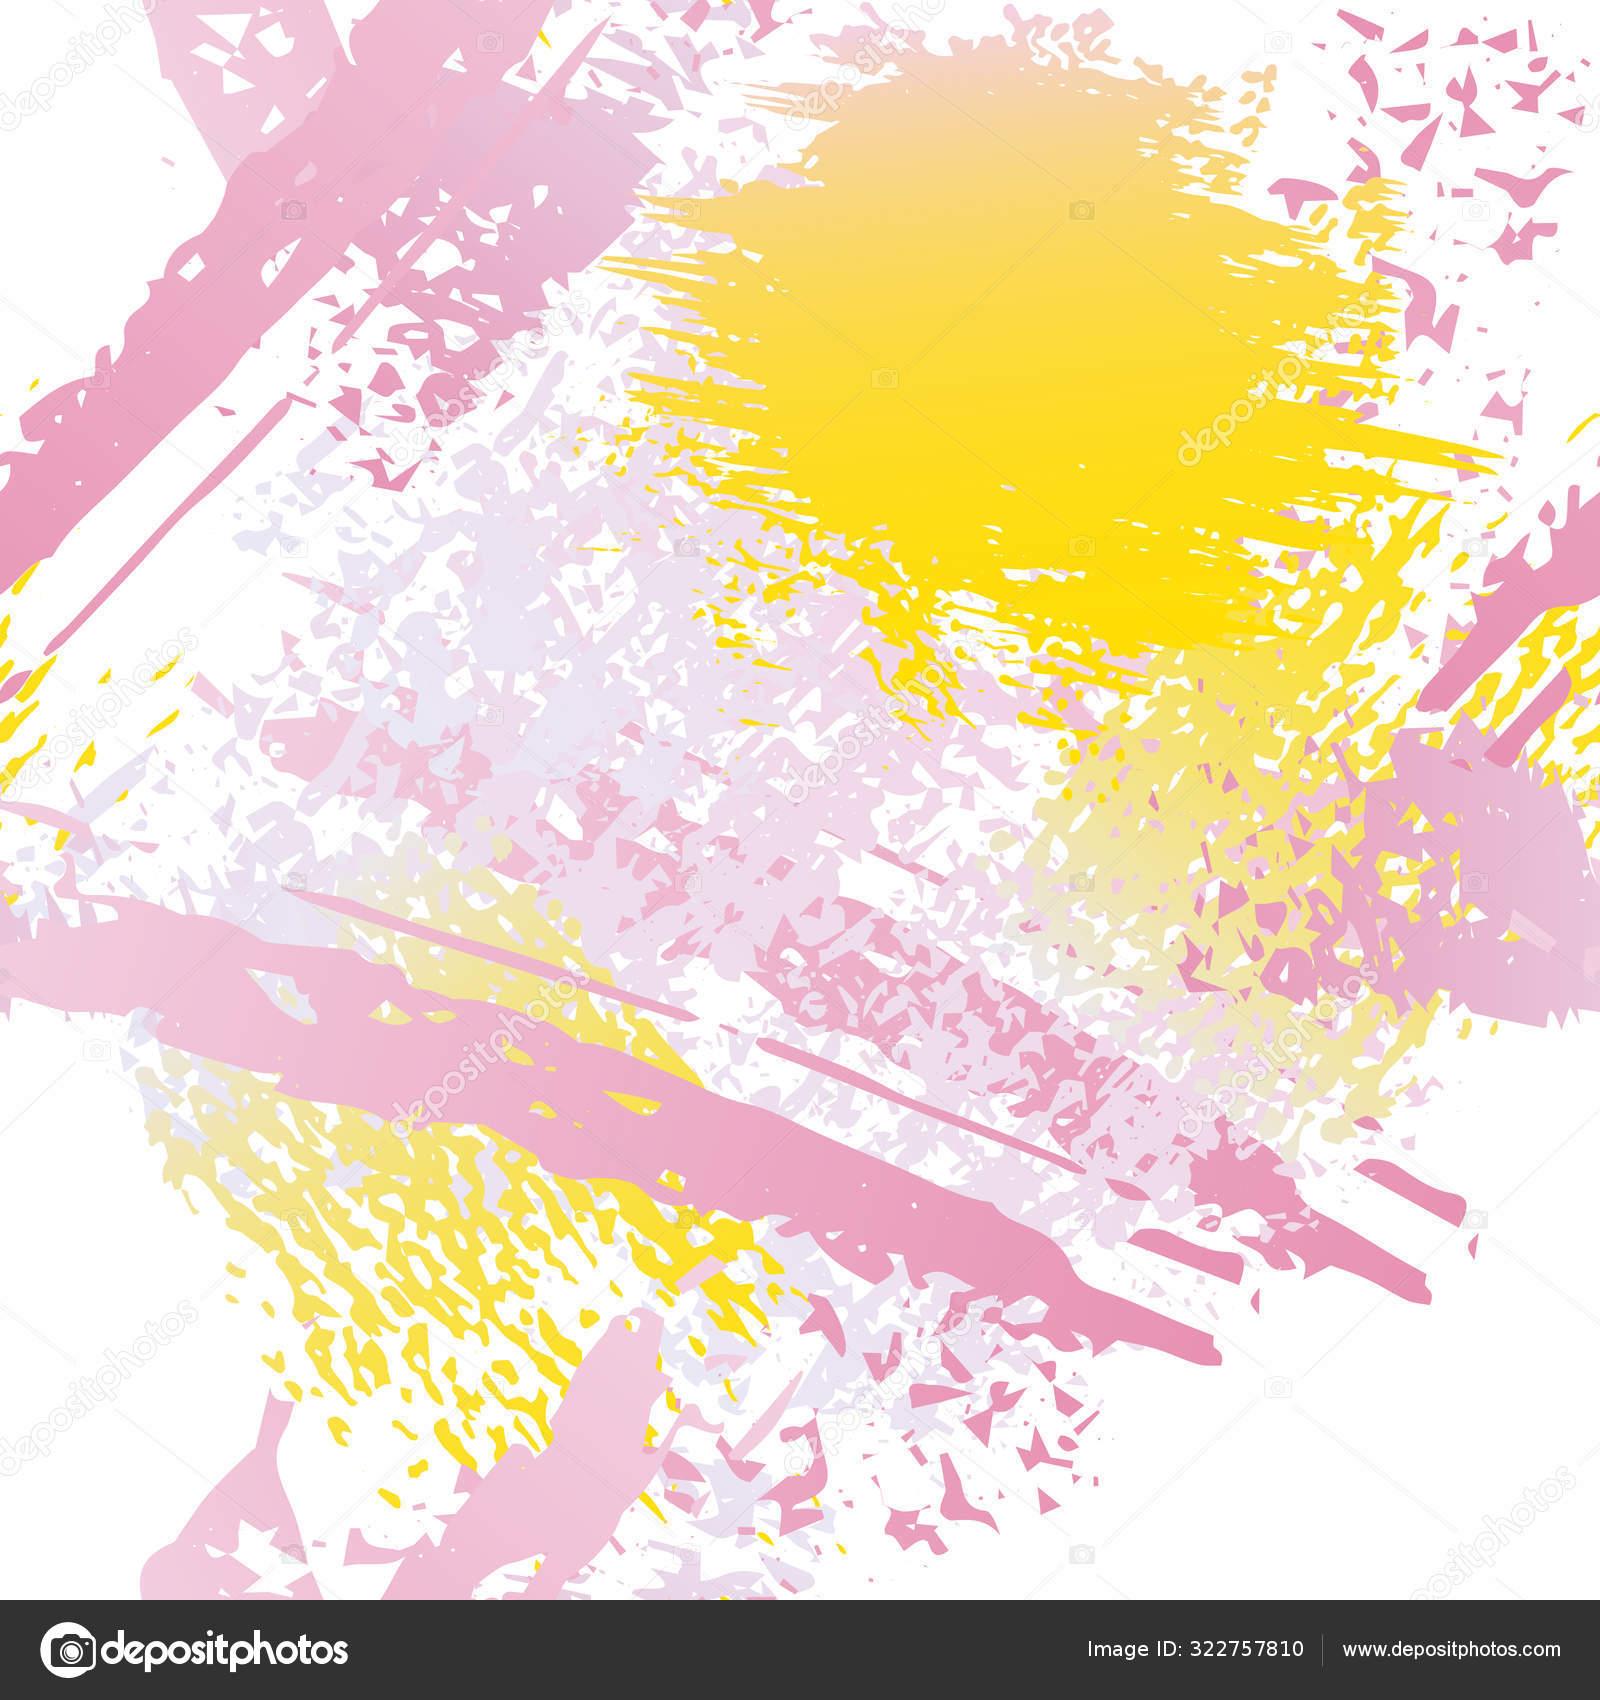 Worn Texture Splatter Surface Paint Endless Stock Vector C Asha801209 322757810